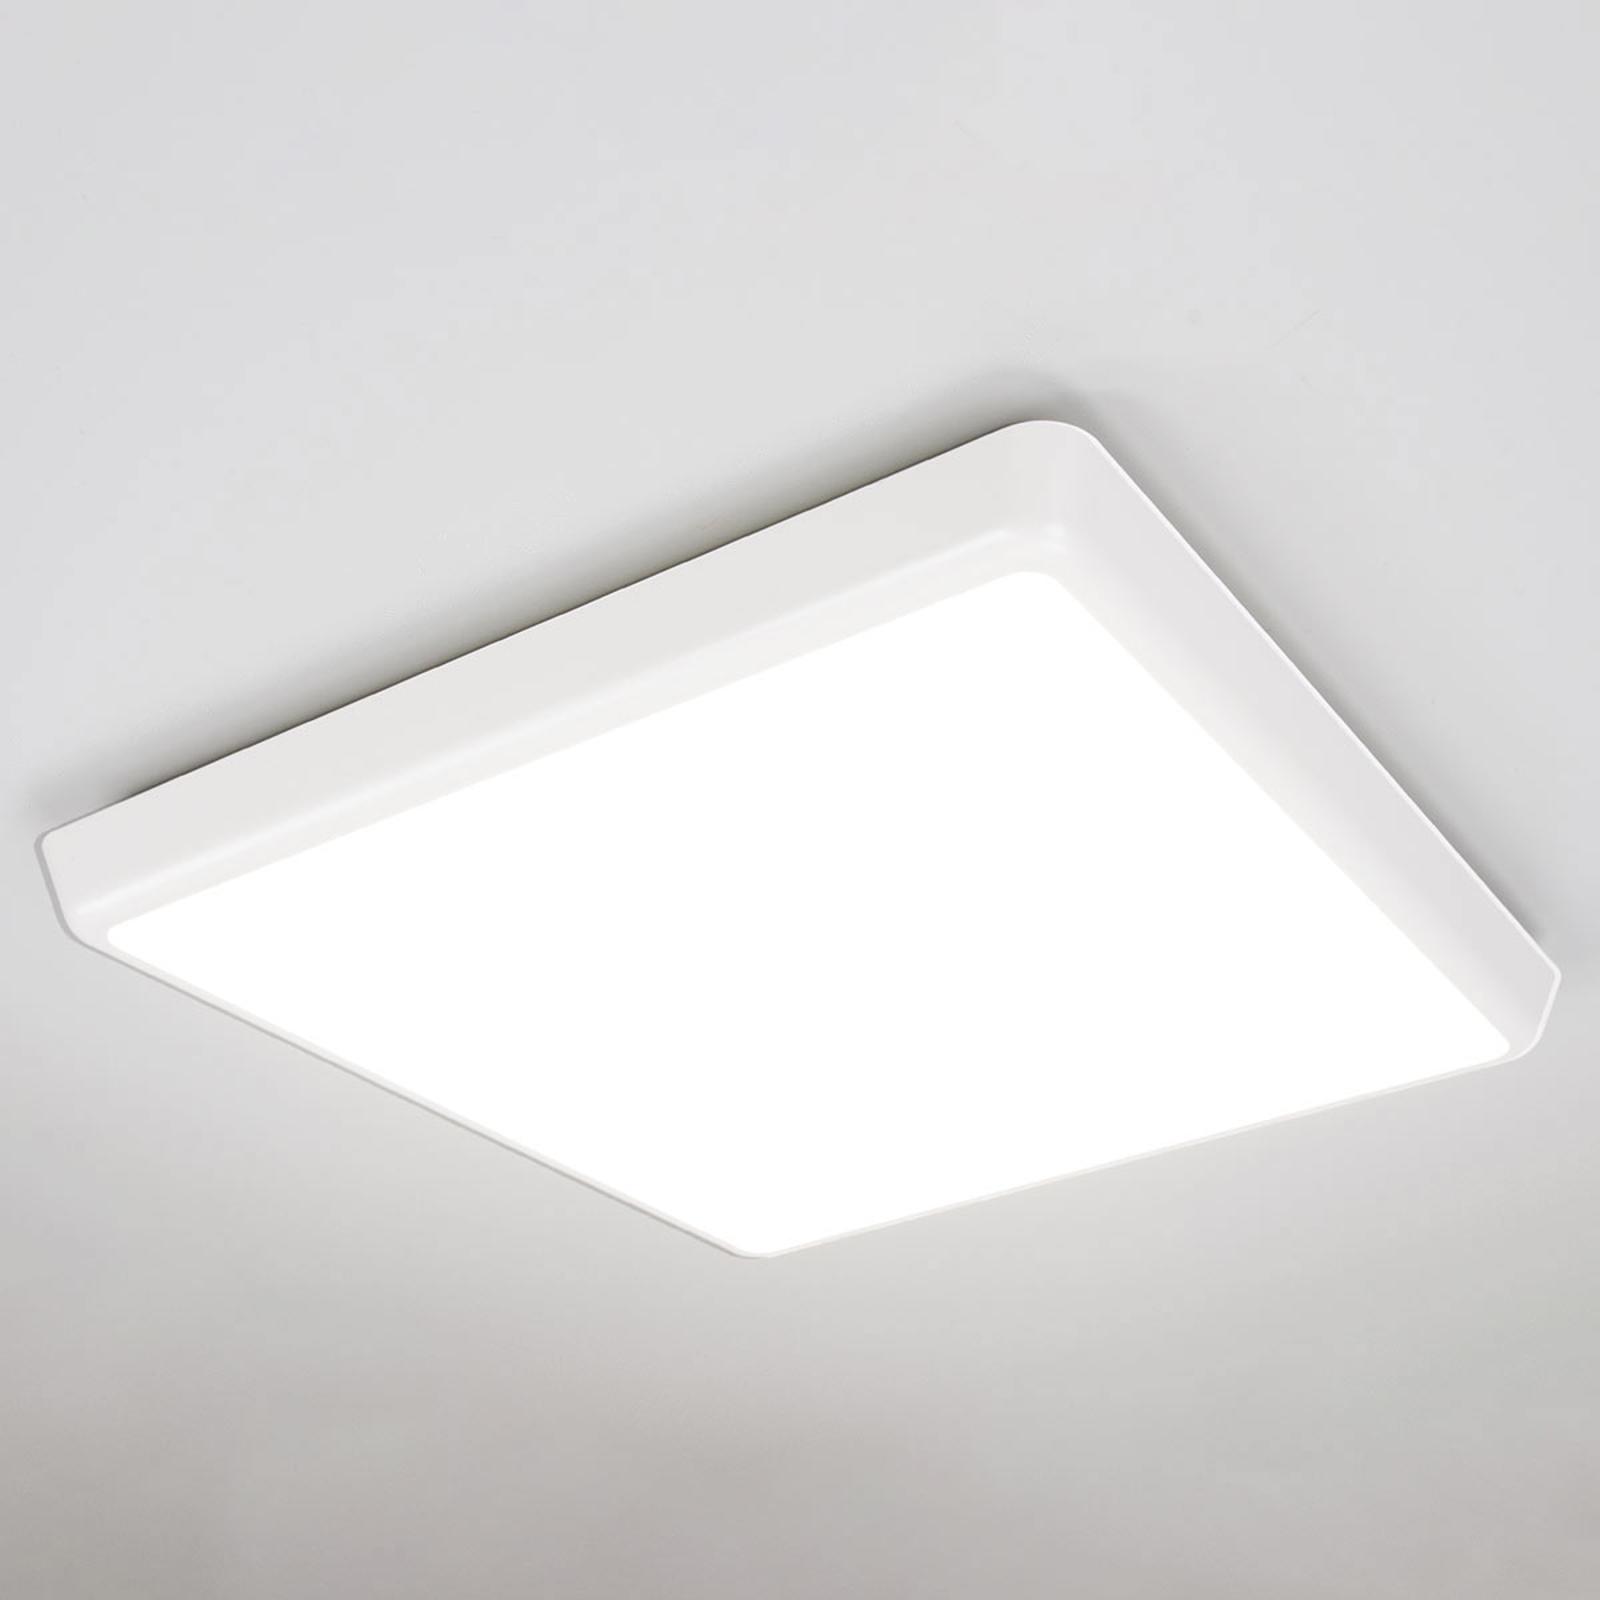 Subtelna lampa sufitowa LED Augustin IP54, 40 cm